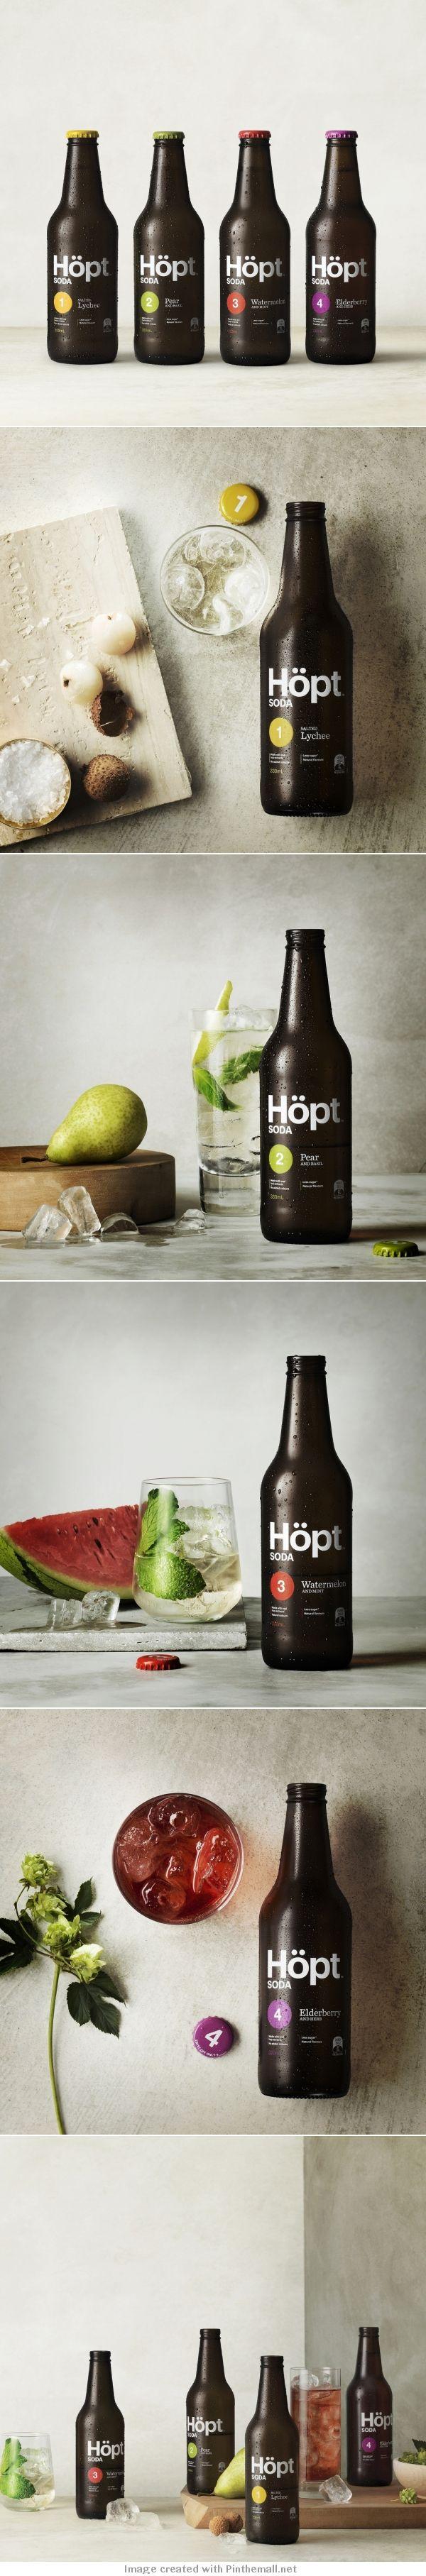 Cool Brand Identity Design. Hopt Soda. #branding #brandidentity [http://www.pinterest.com/alfredchong/]